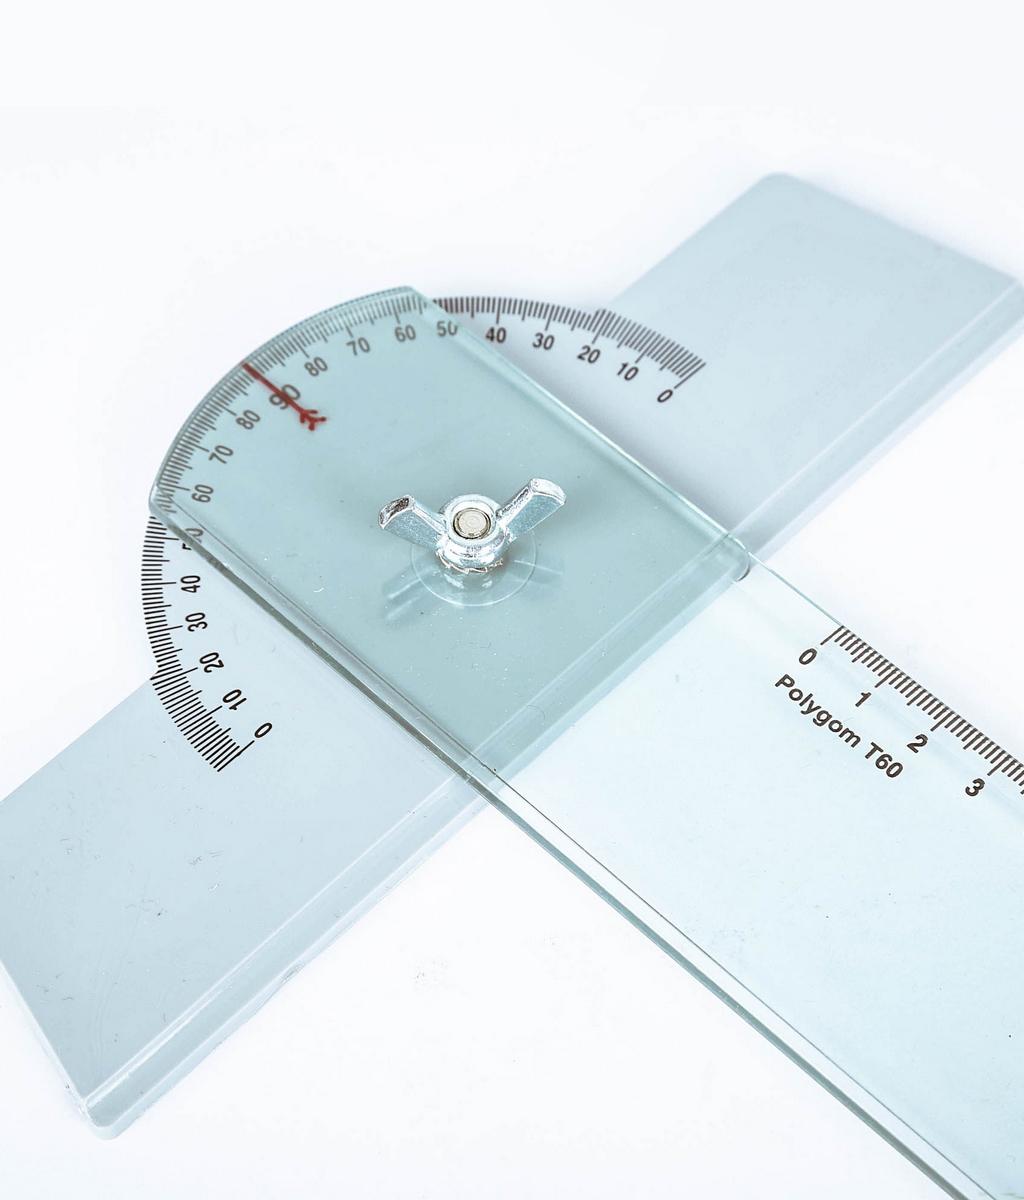 TE 60 cm – Tete rapporteur rotative TE 60